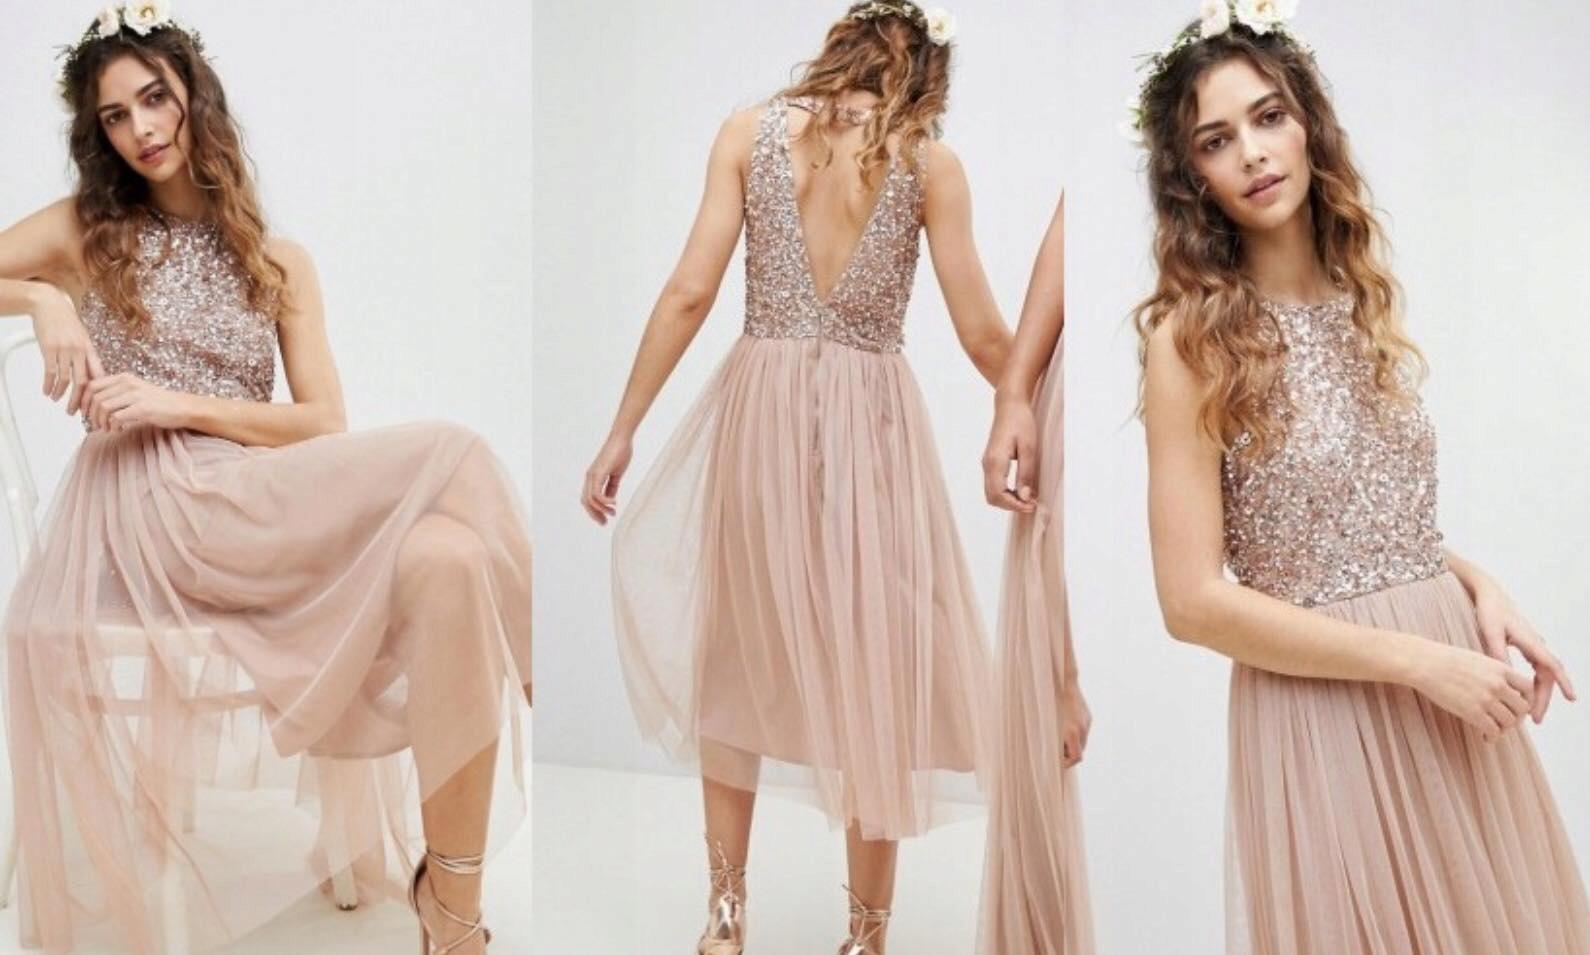 MAYA nude midi sukienka zdobiona tiul cekiny 42 XL